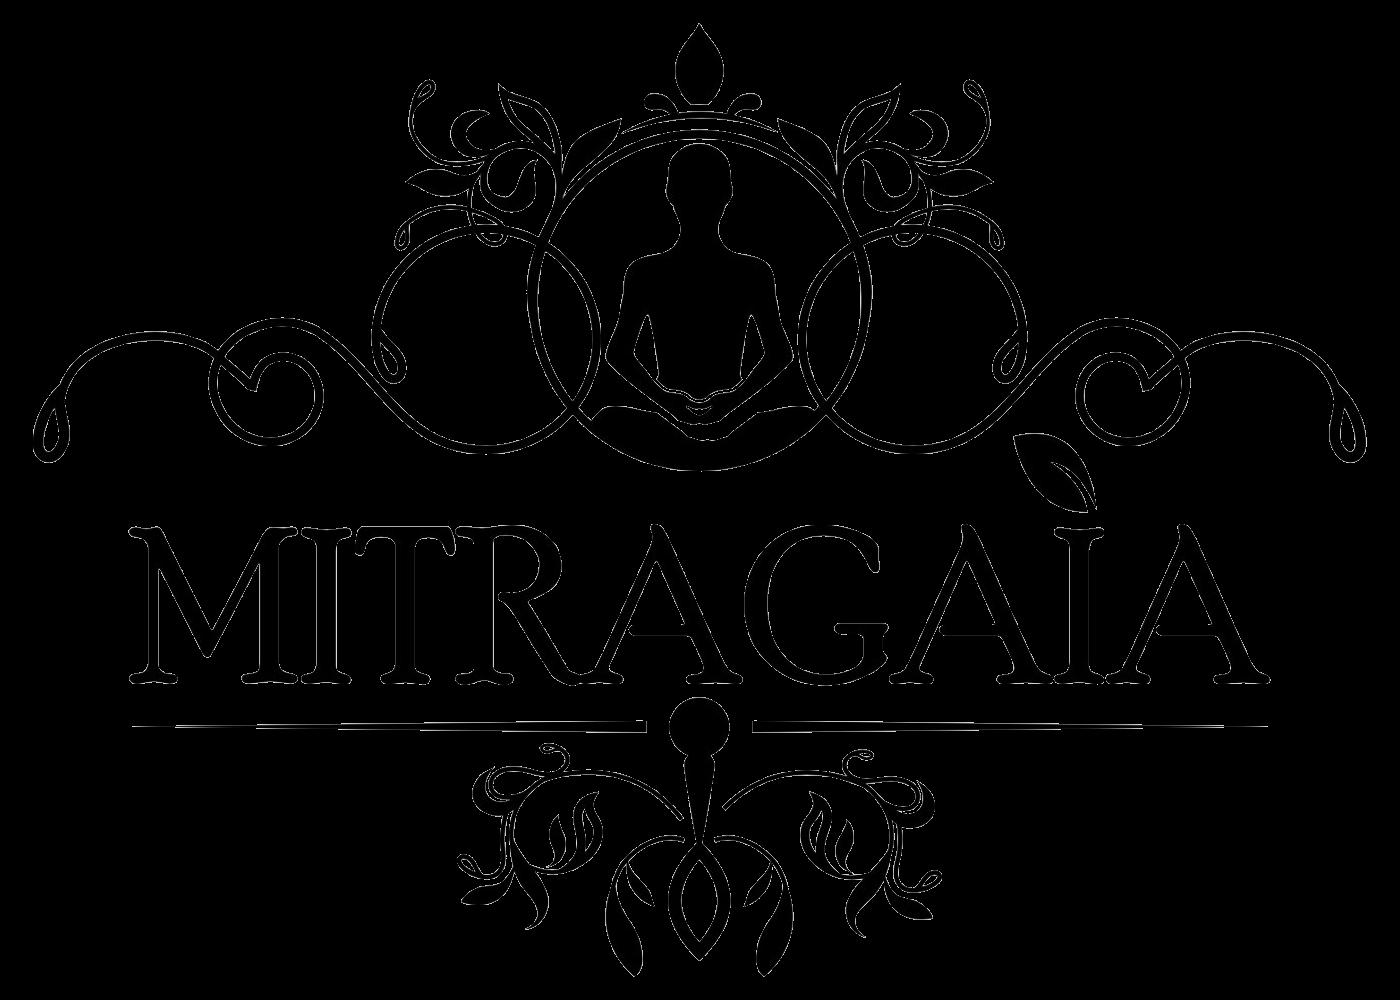 MitraGaia Discount Code